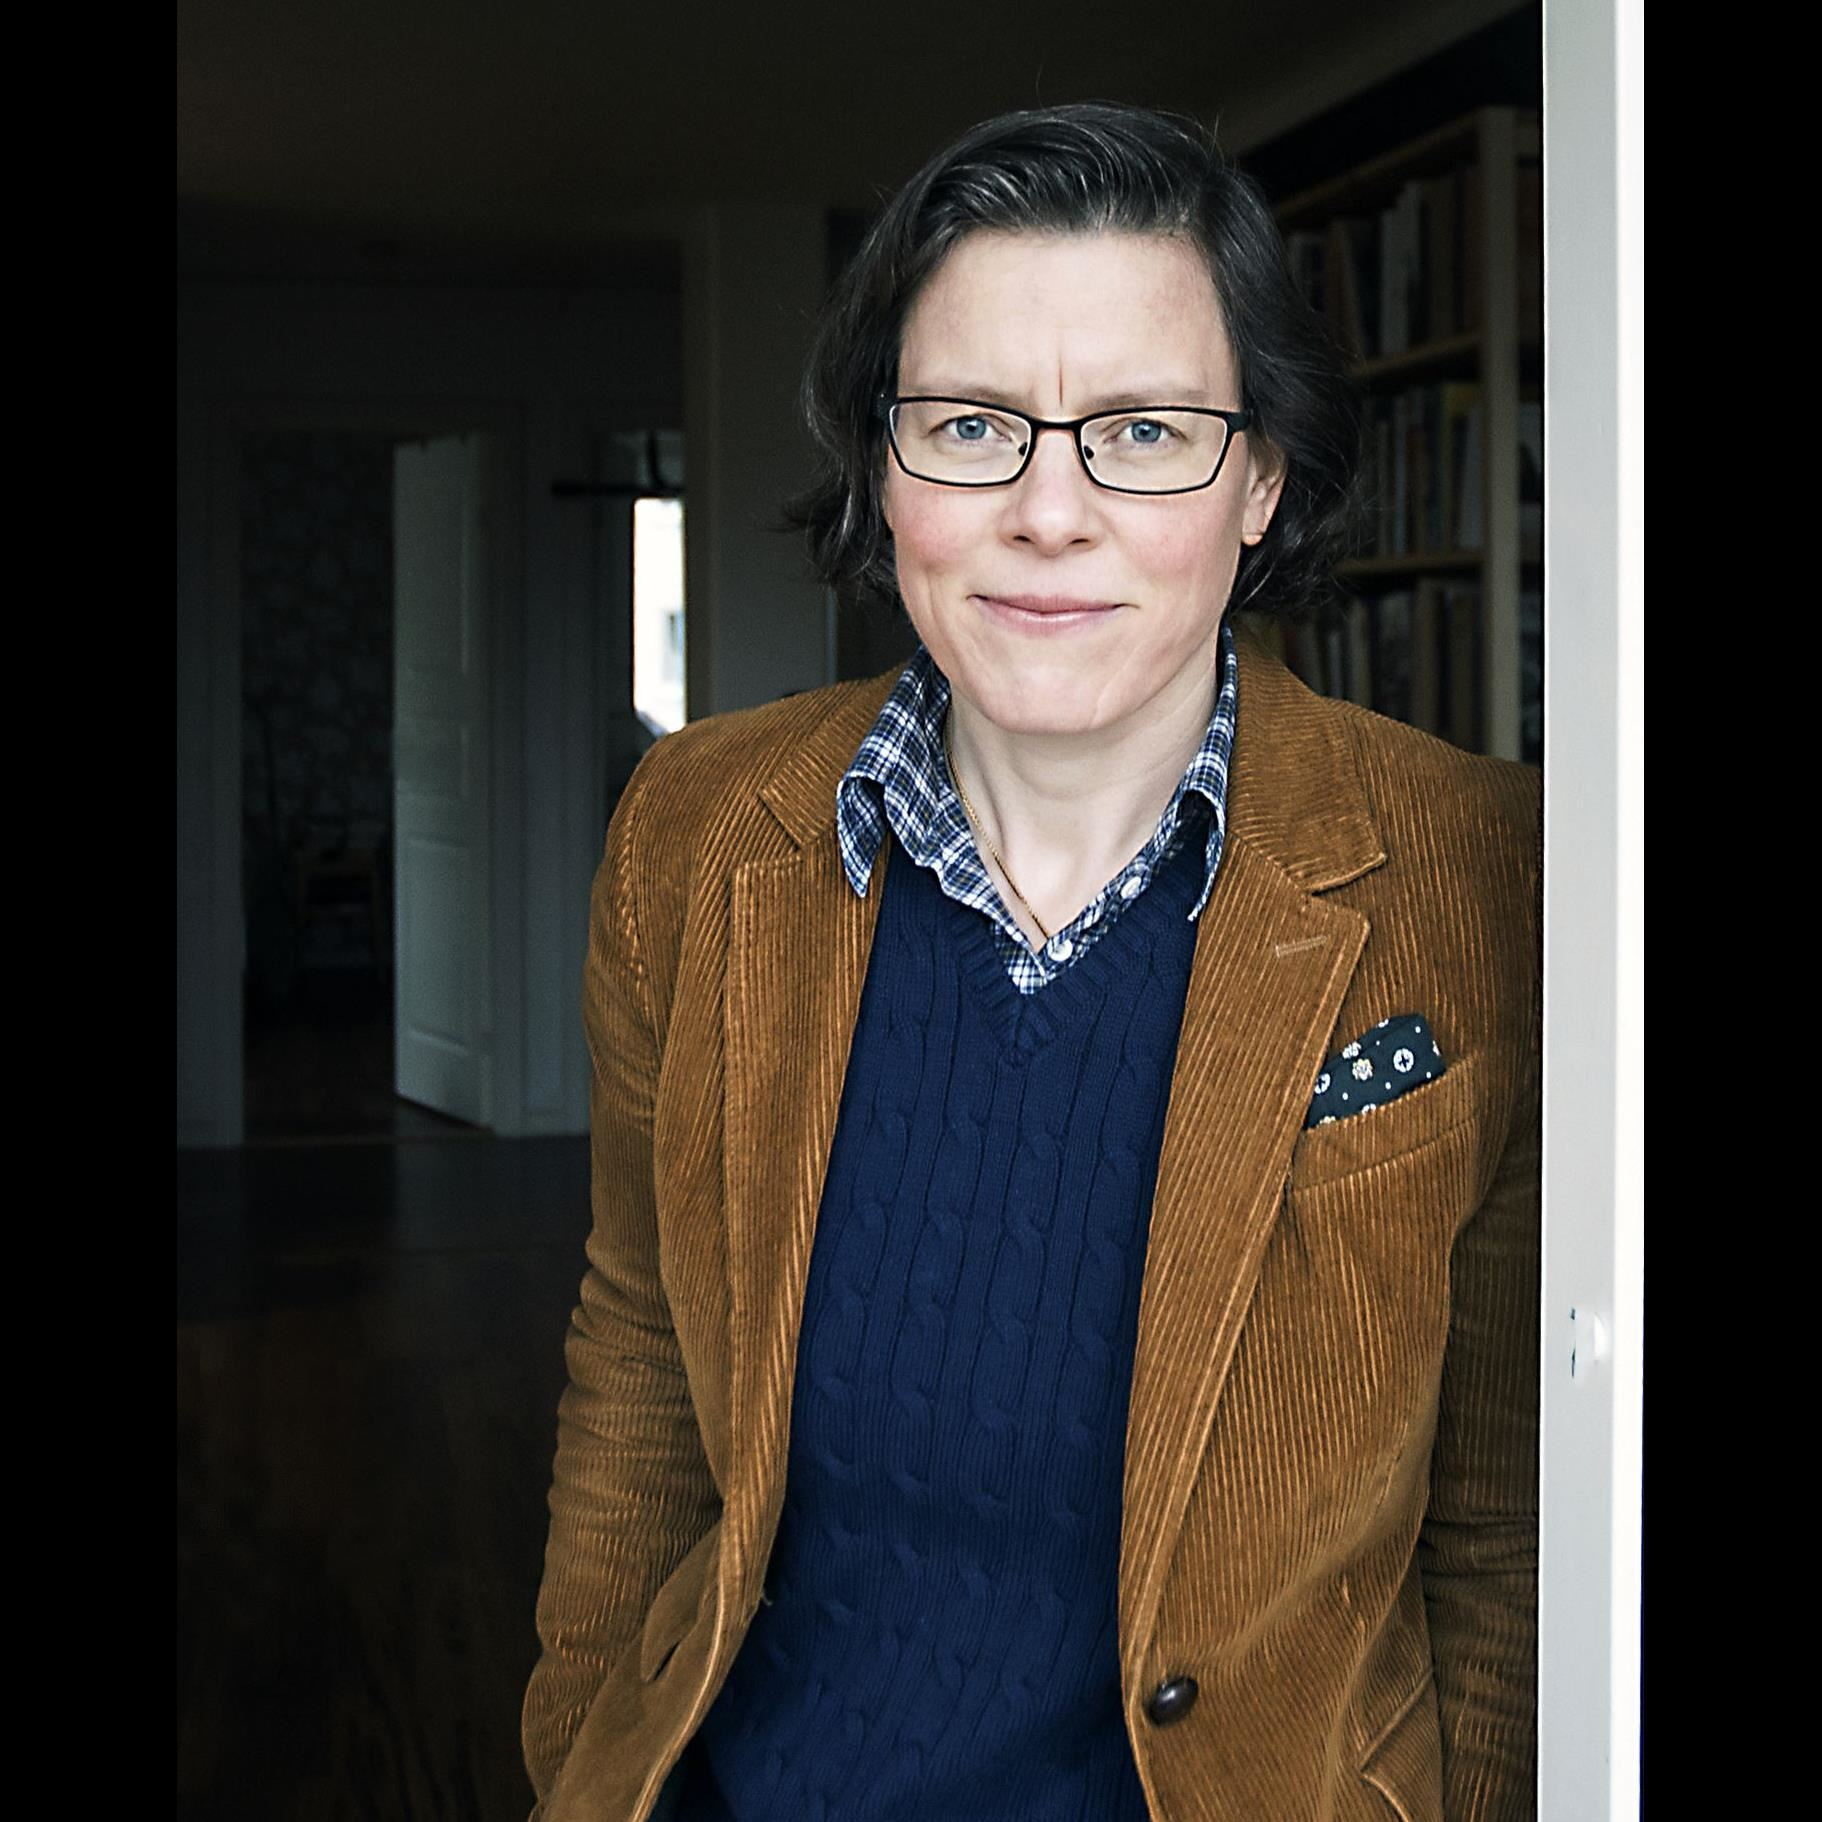 Ulla Montan, Föredrag med Lena Andersson